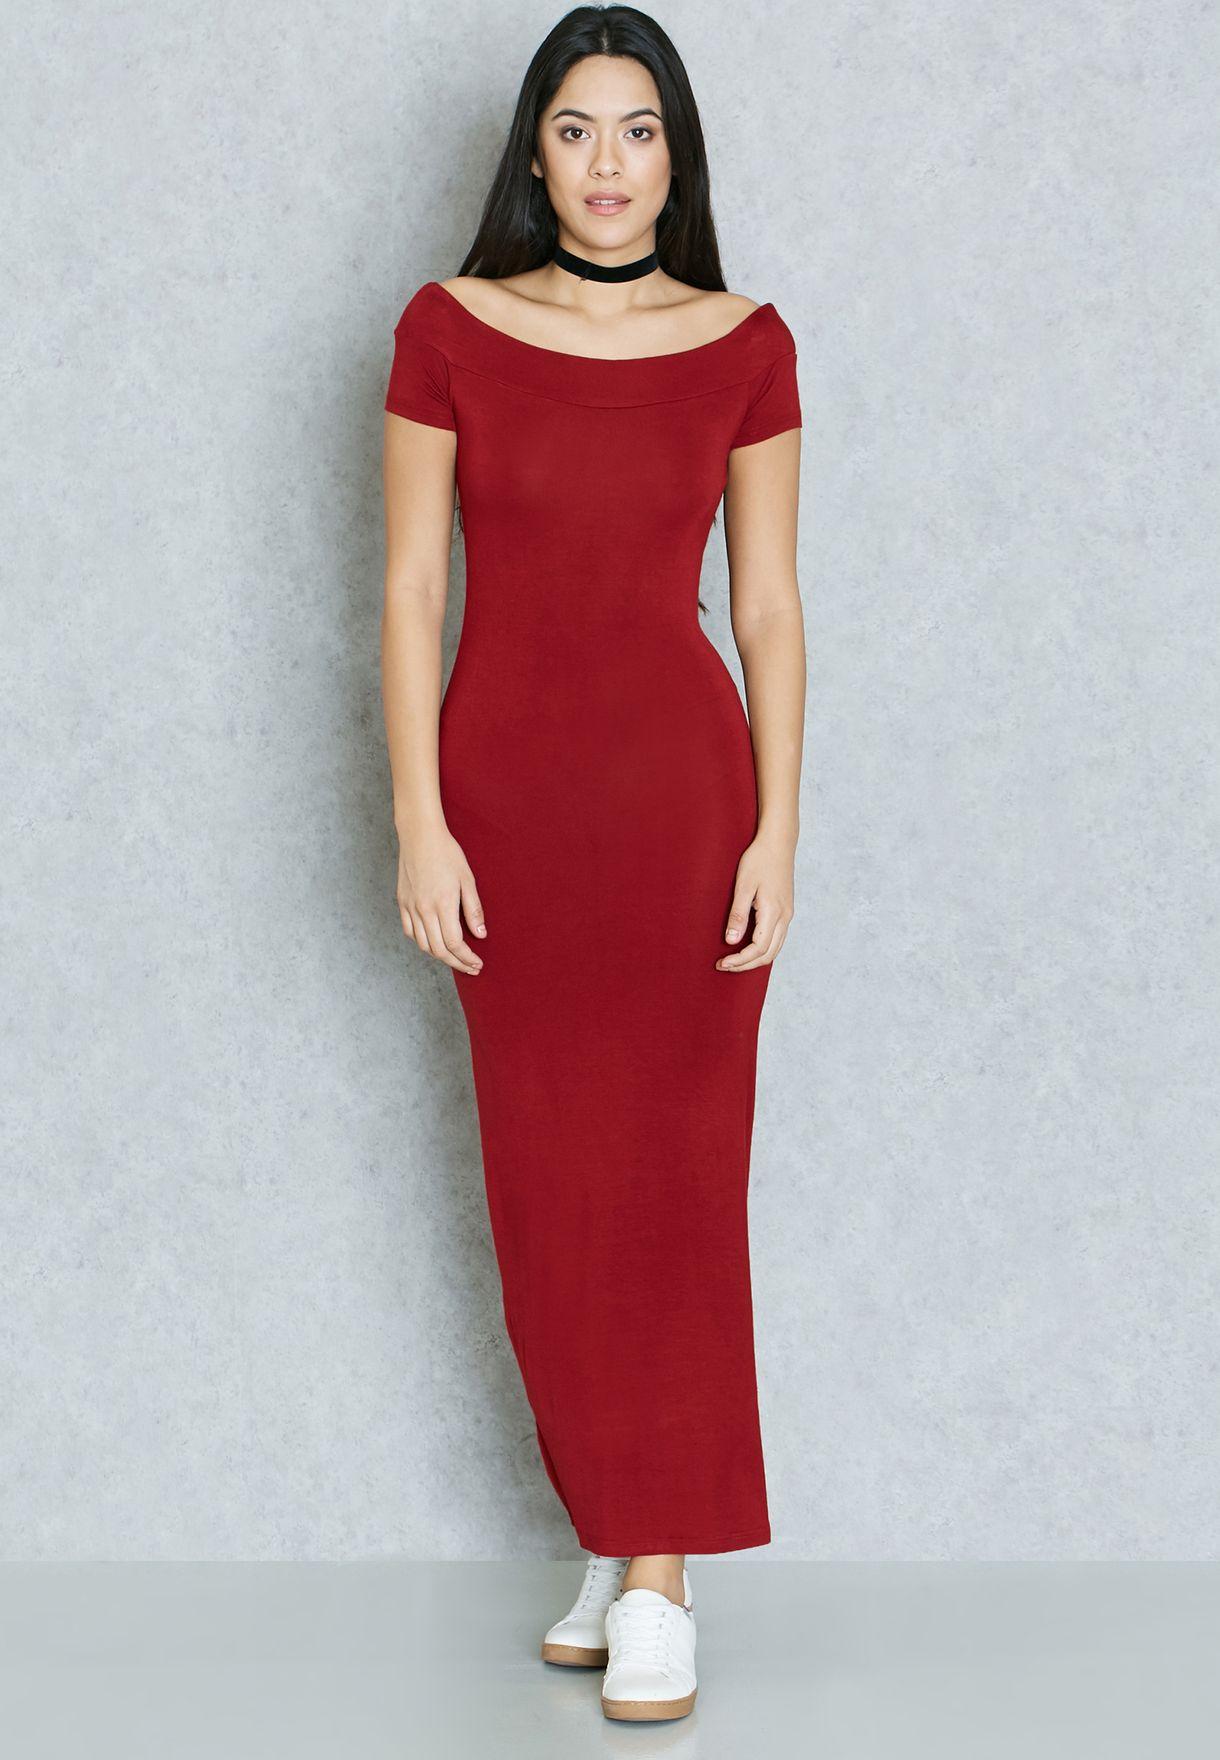 4156ad5b9b9 Shop Ginger Basics red Bardot Maxi Dress for Women in Qatar ...